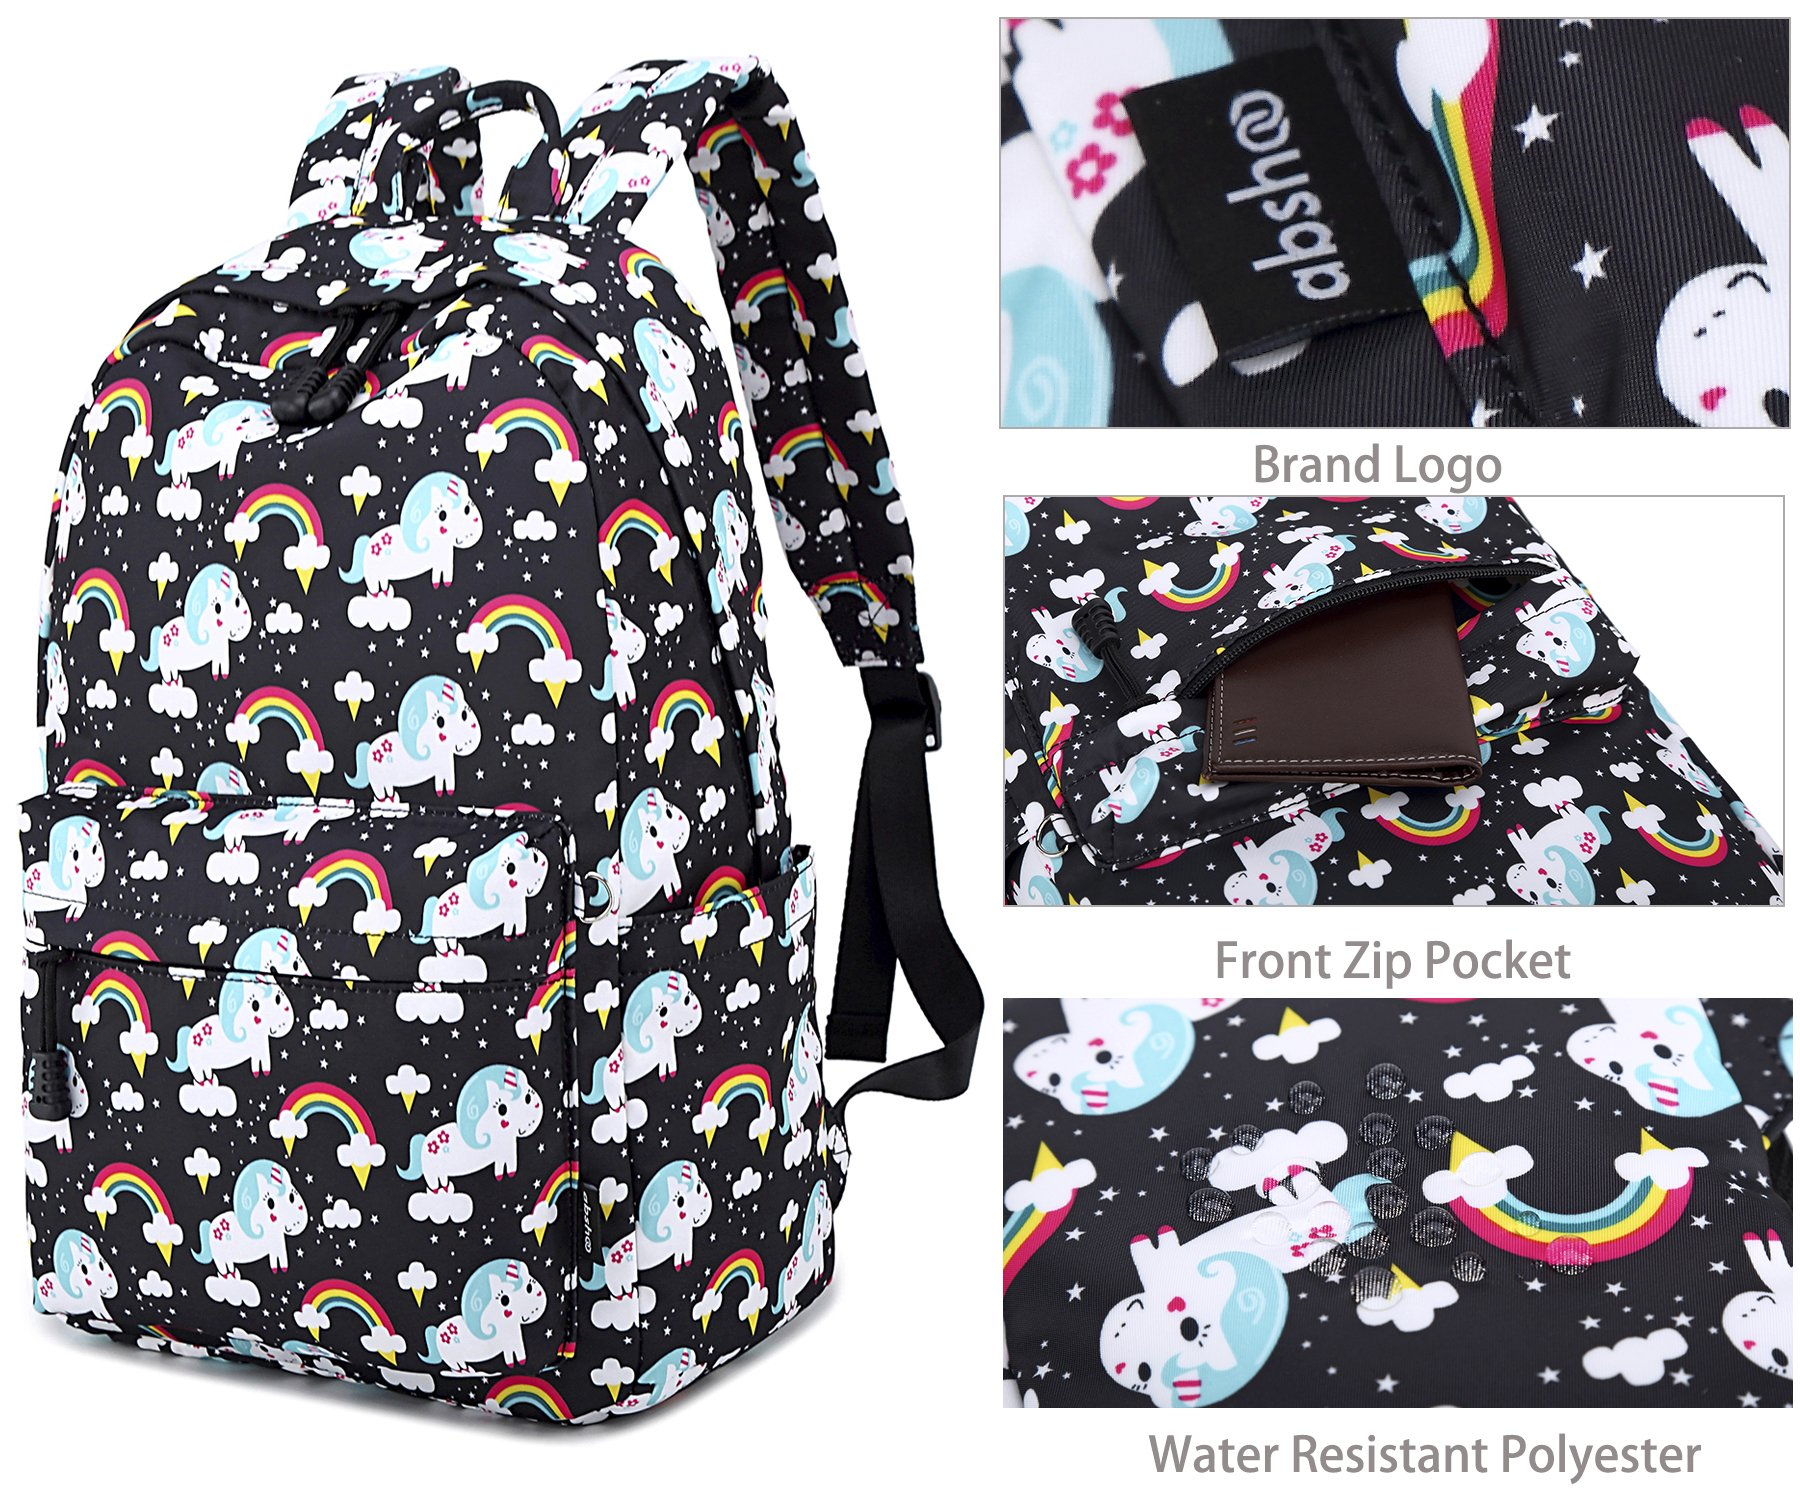 Abshoo Cute Lightweight Unicorn Backpacks Girls School Bags Kids Bookbags 7